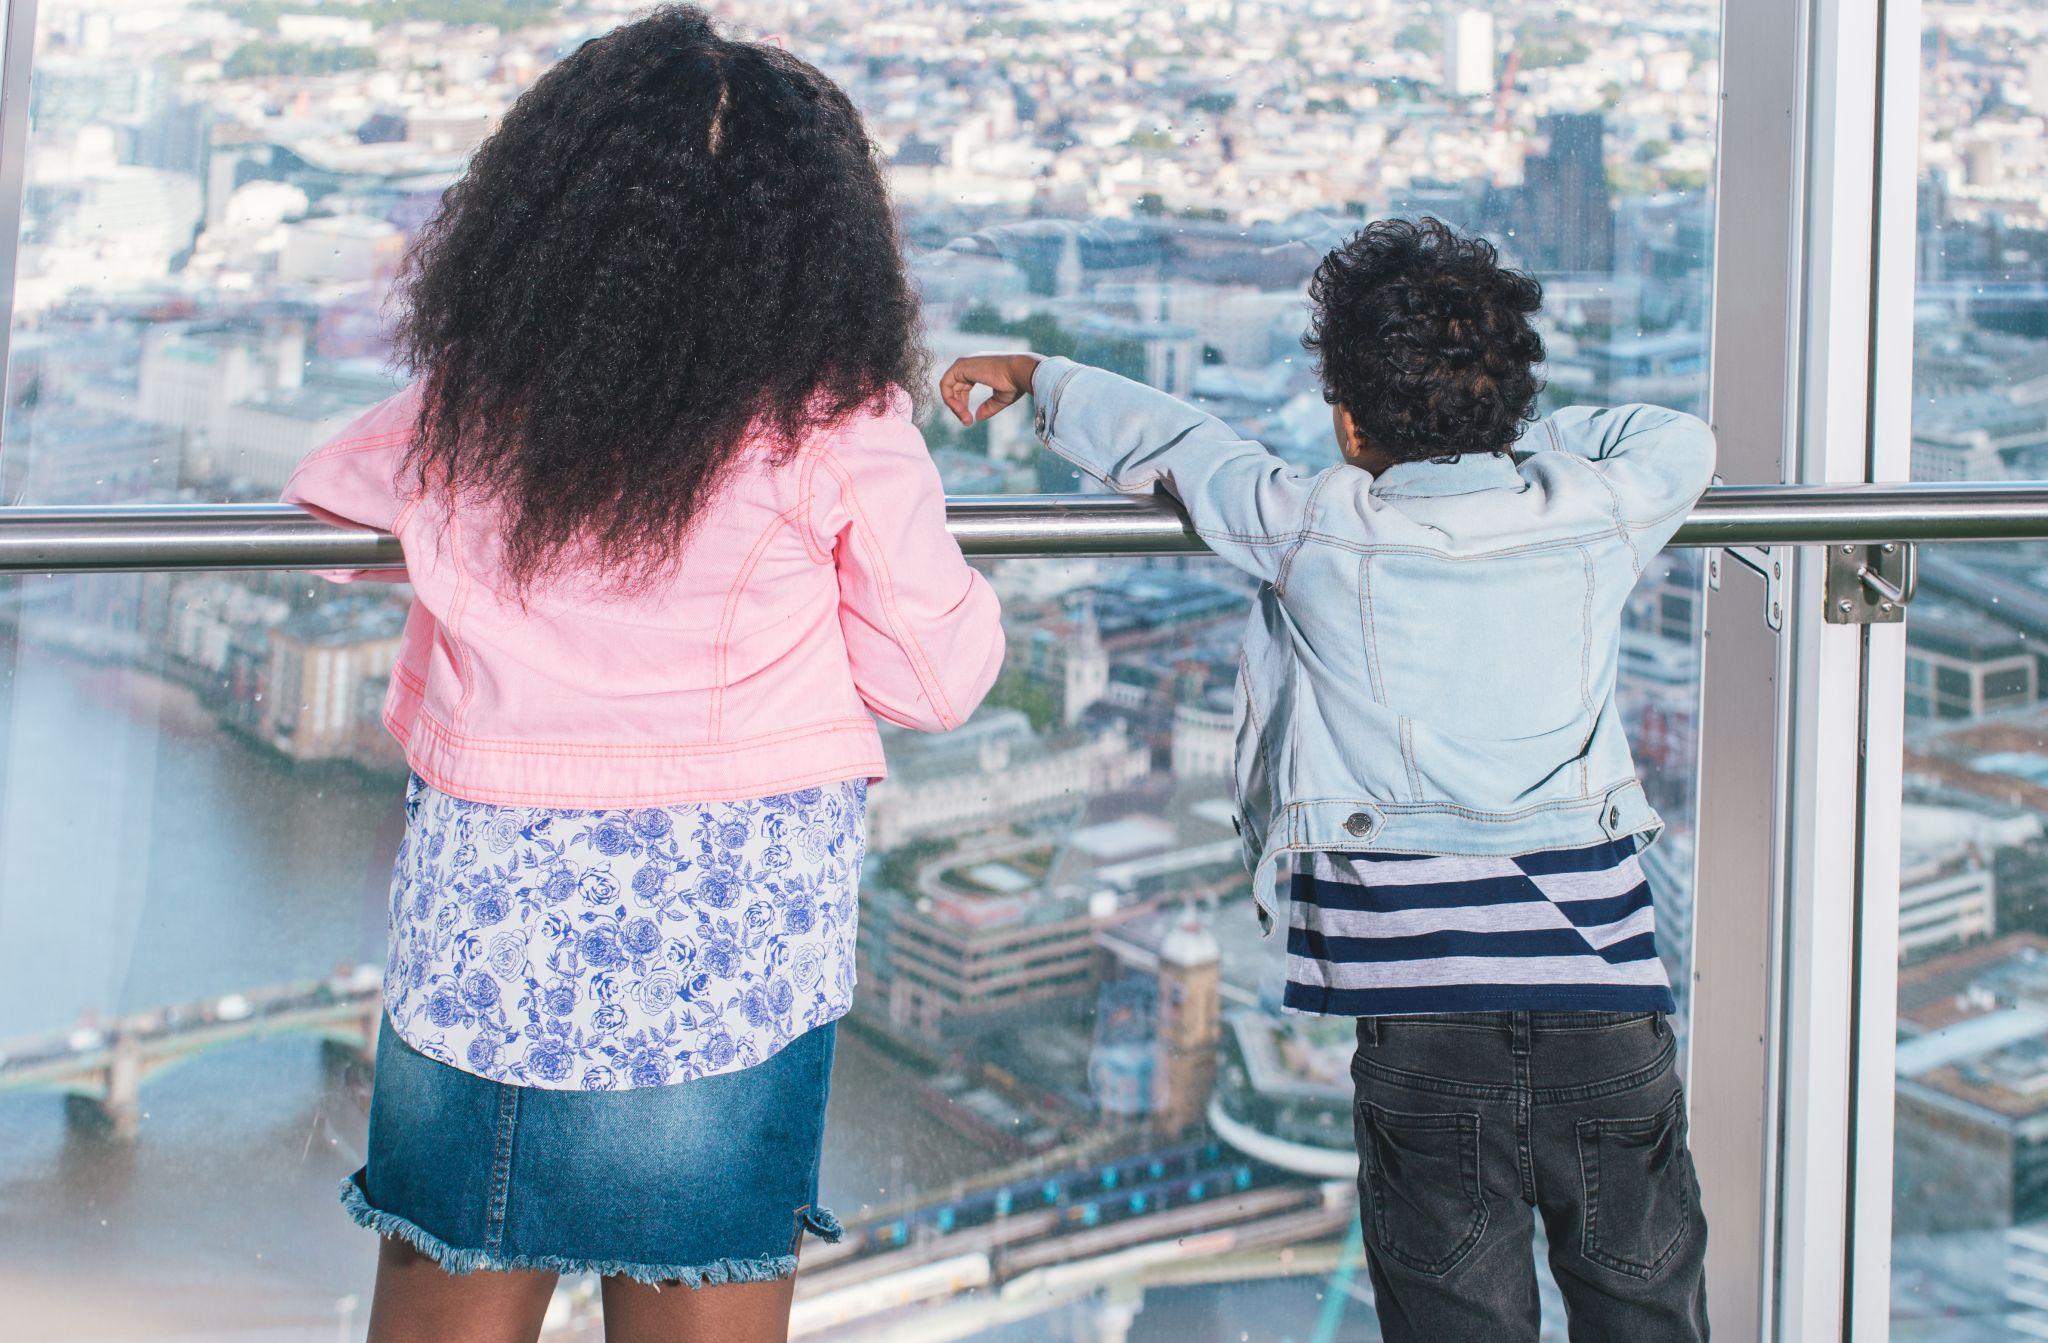 Sensational Summer in London 2019 - Picniq Blog